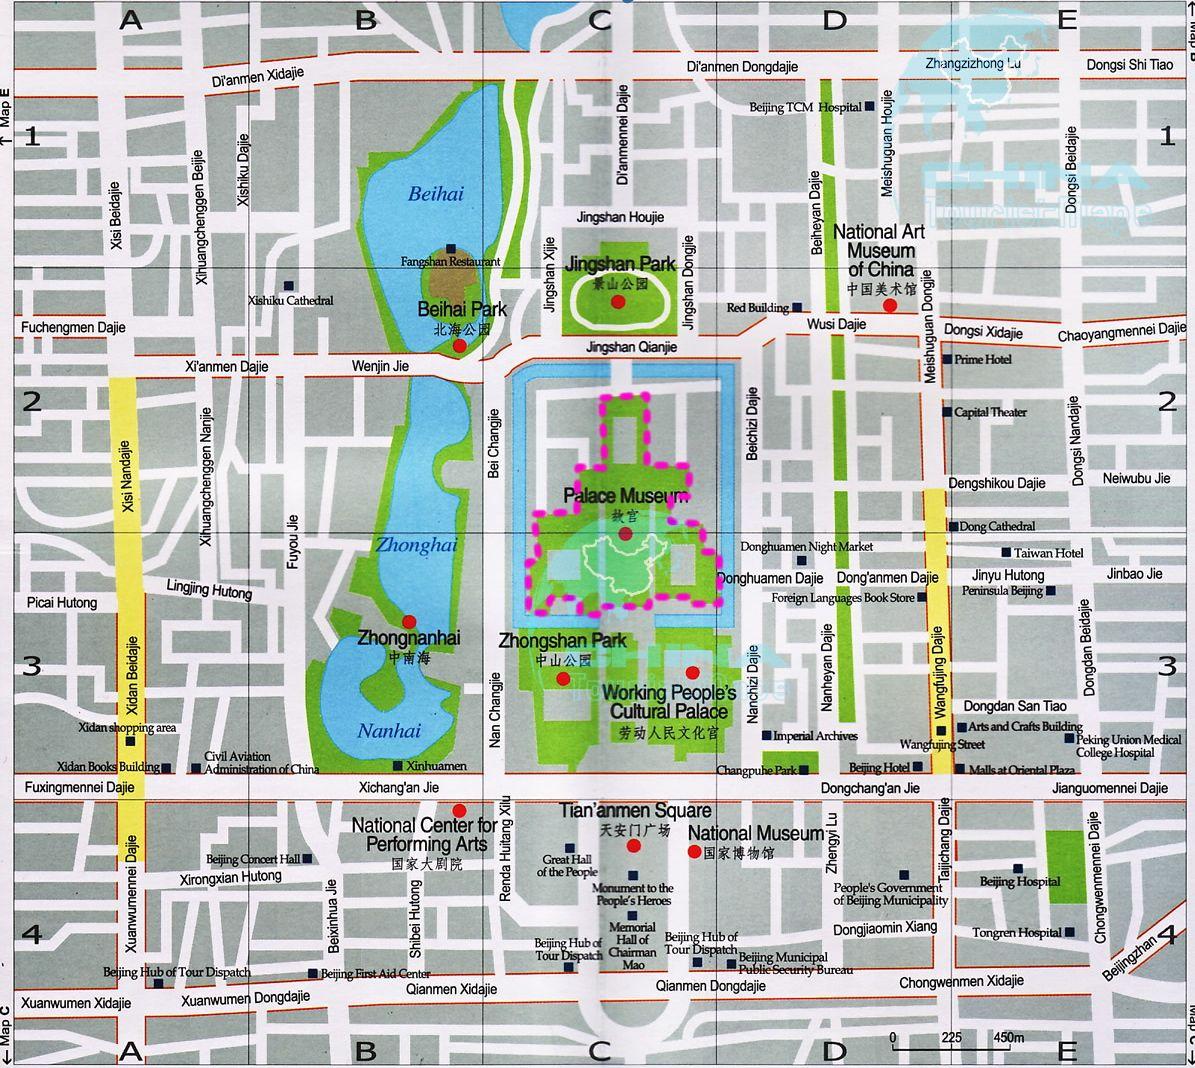 Lonely Planet Beijing Subway Map.Tourist Map Of Beijing City Center Forbidden City Tiananmen